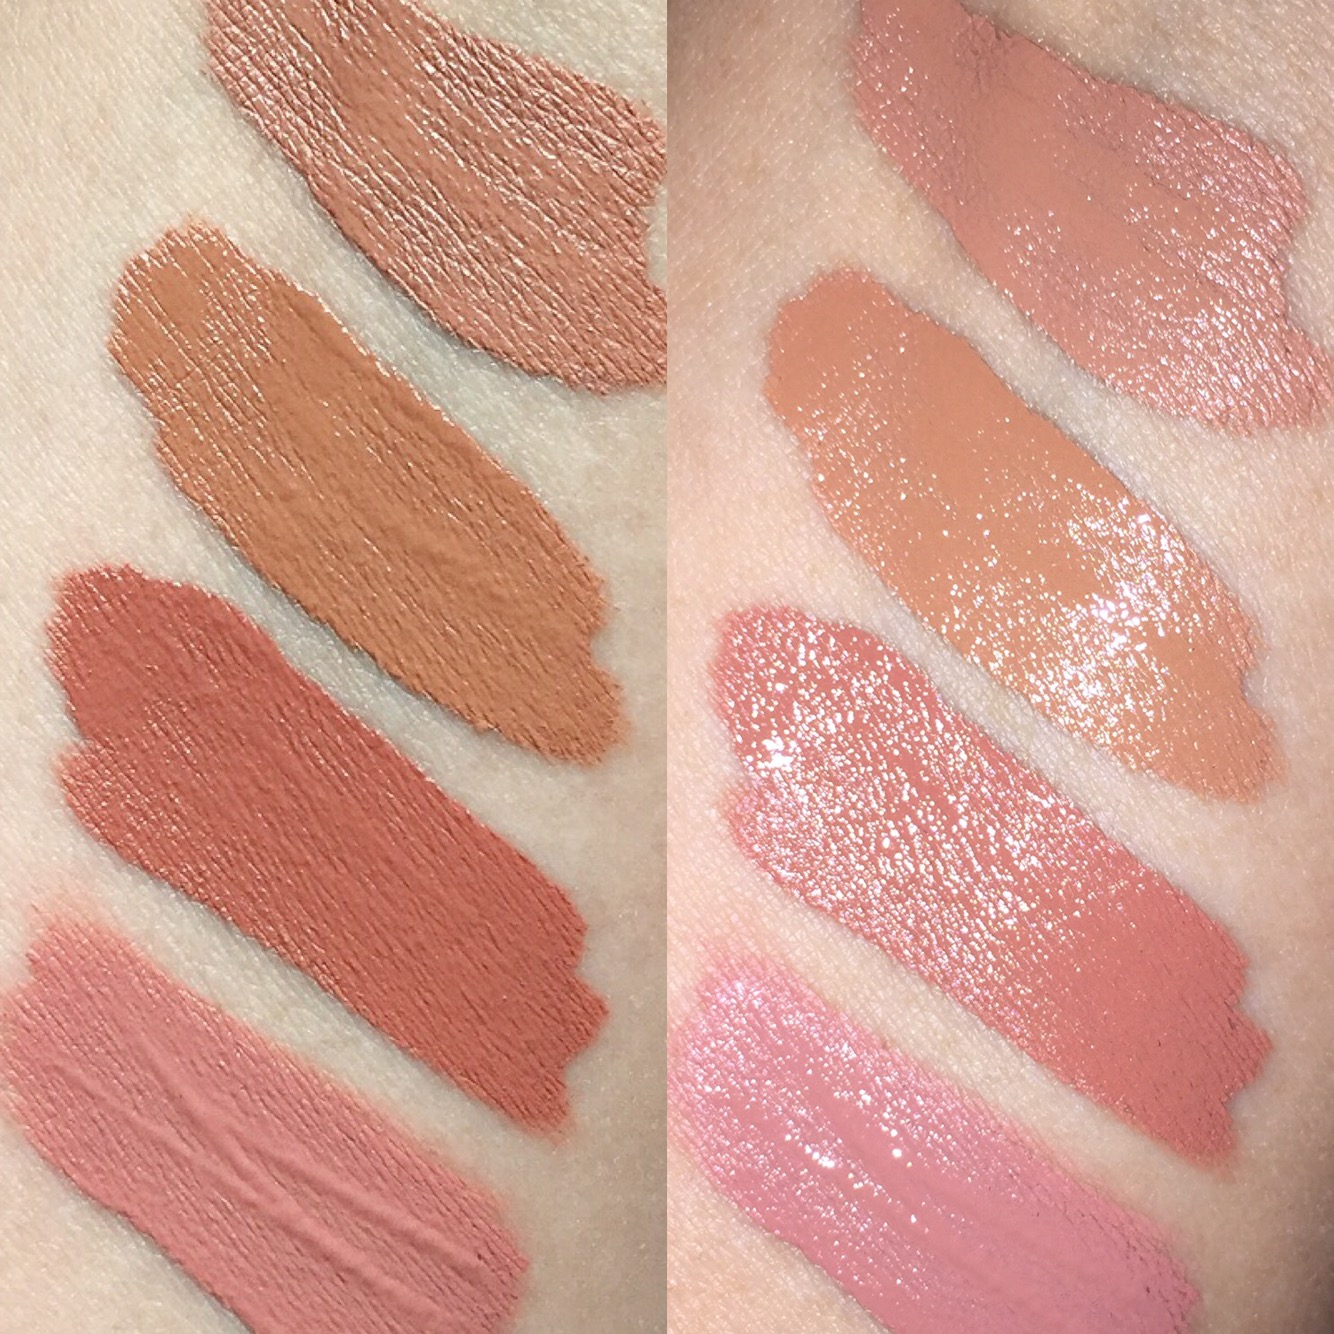 Velvet Liquid Lipstick by Kylie Cosmetics #10